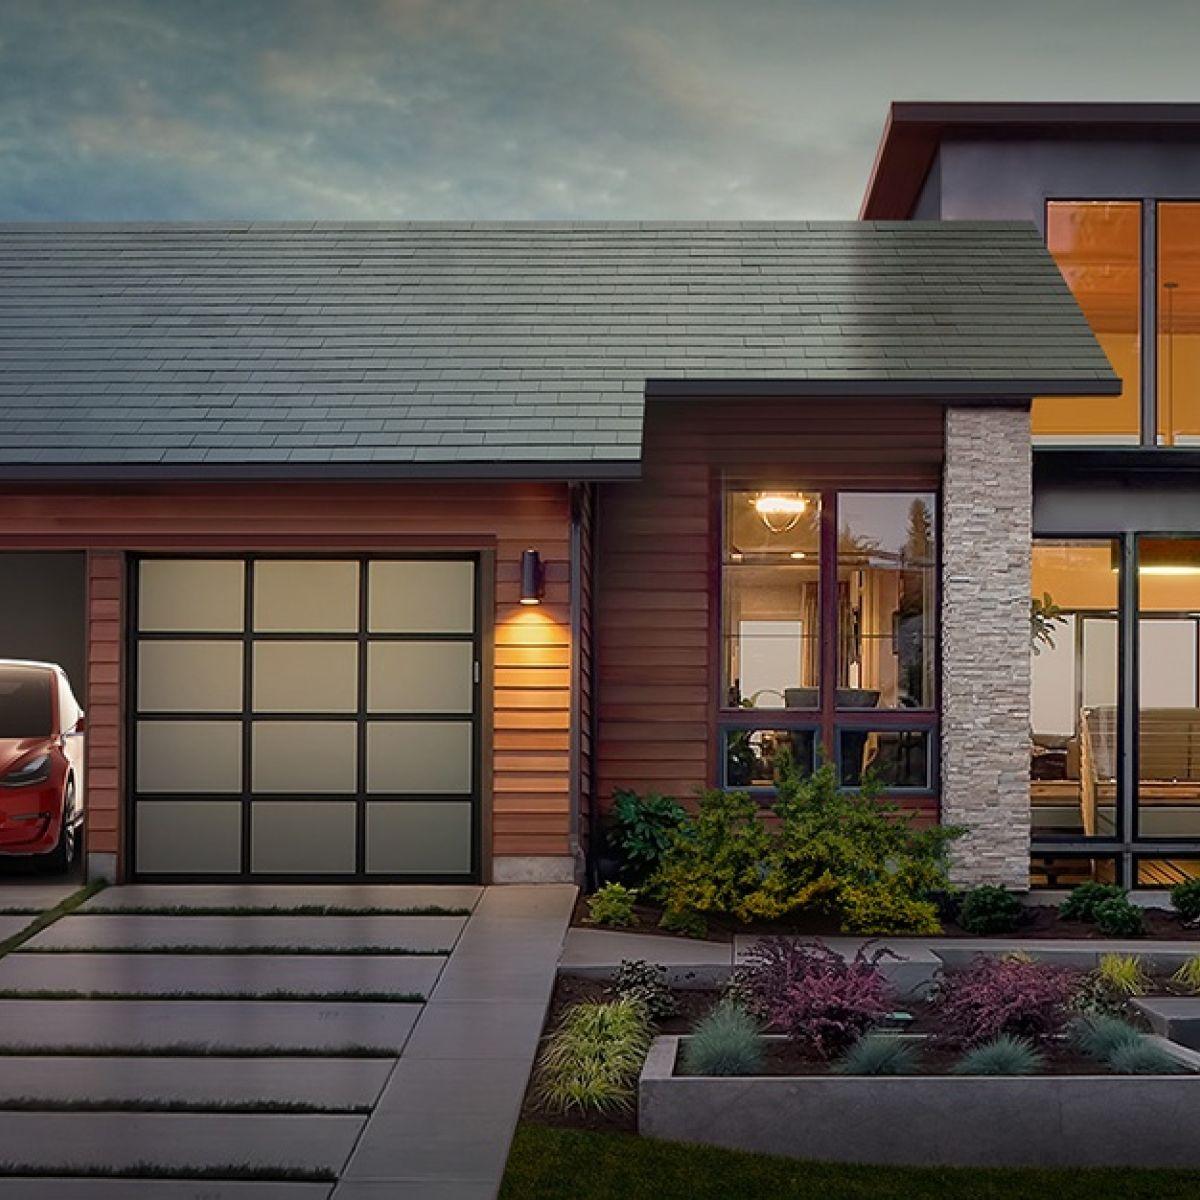 Tesla Solar Panel Roof >> Elon Musk Showcases Tesla S New Solar Roof